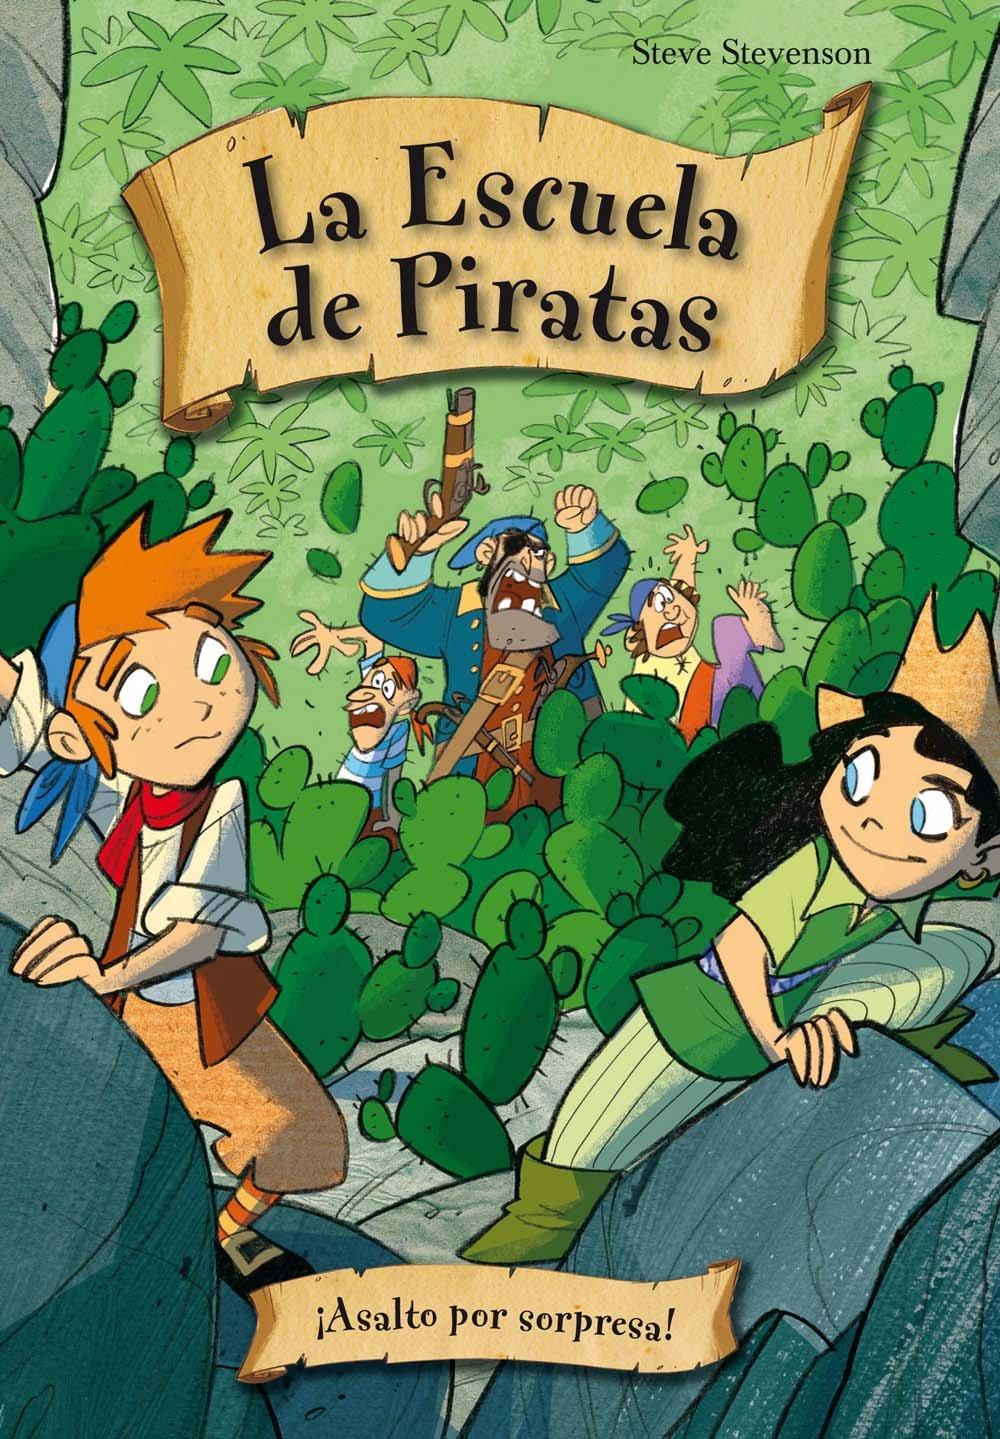 Download Escuela de piratas 6. Asalto a sorpresa (Escuela De Piratas / Pirate School) (Spanish Edition) (La Escuela de Piratas / Pirate School) PDF